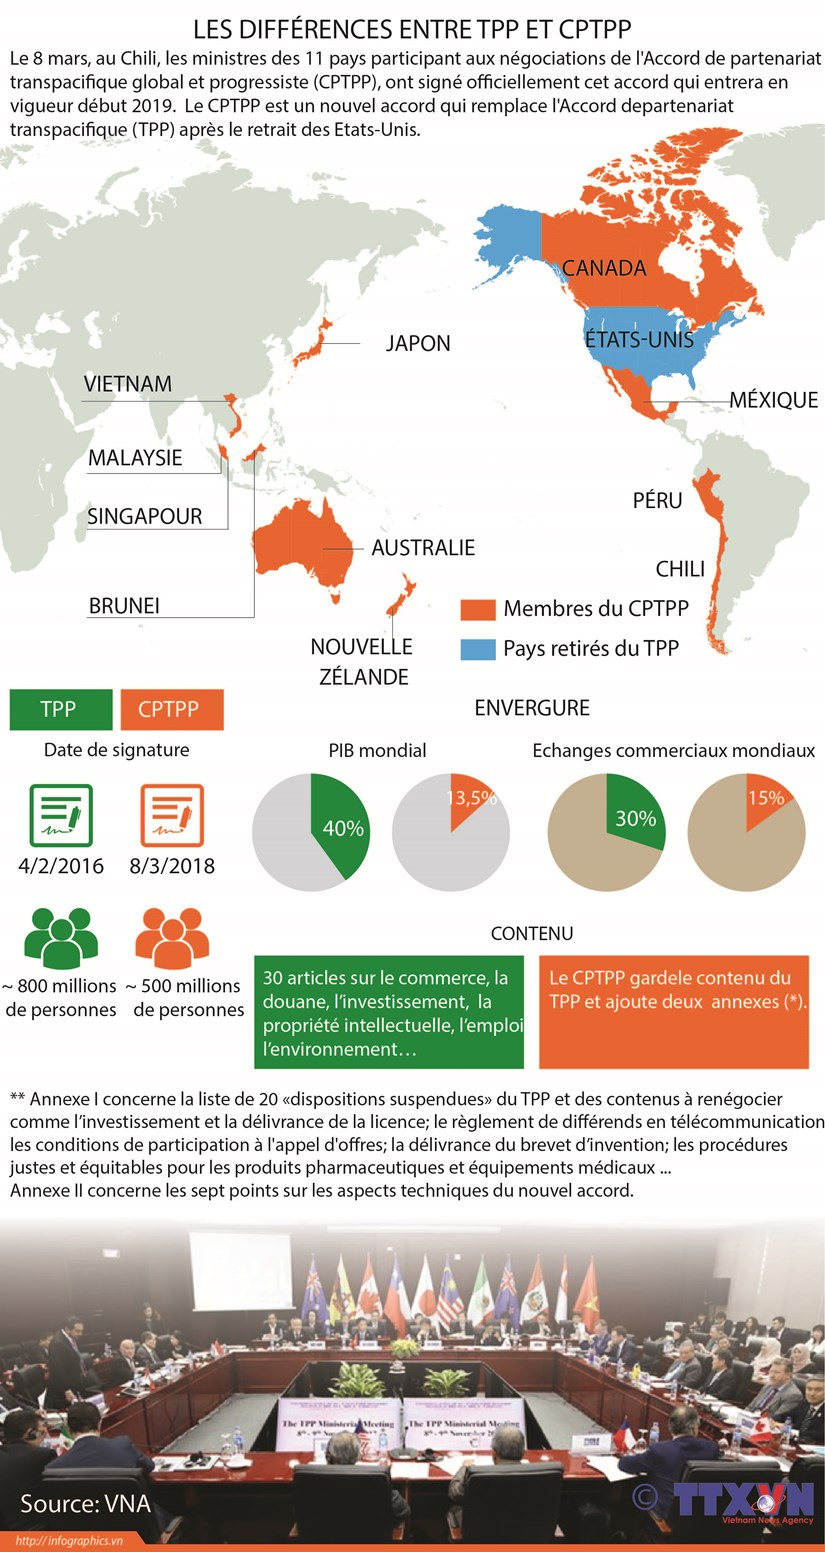 Les differences entre TPP et CPTPP hinh anh 1